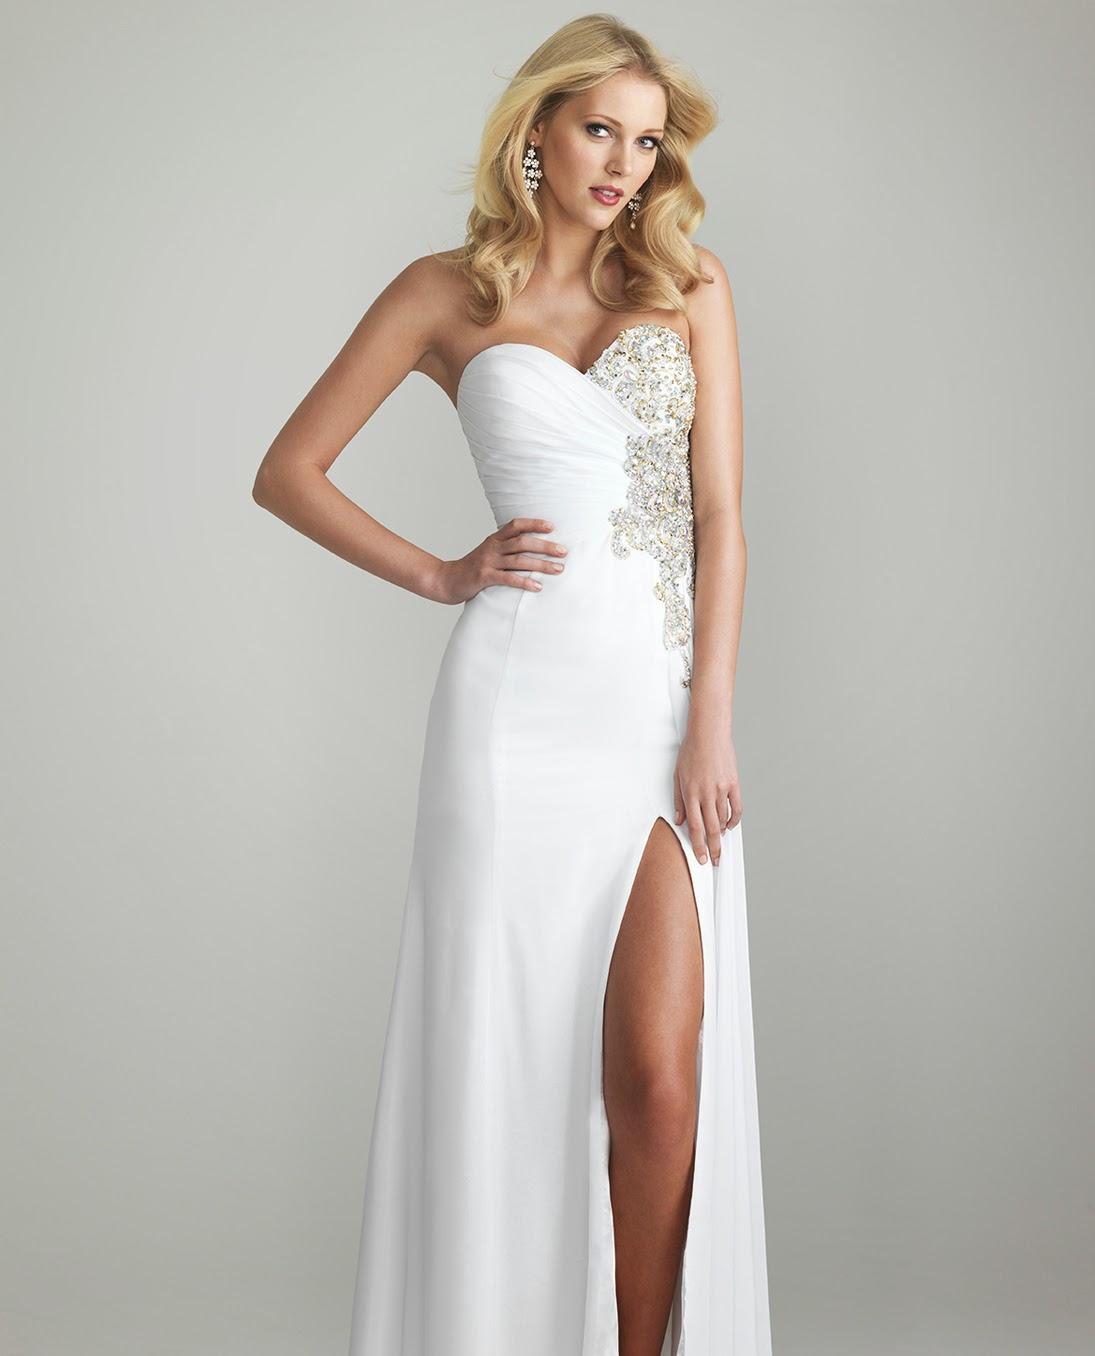 WhiteAzalea Prom Dresses: Beautiful White Prom Dresses